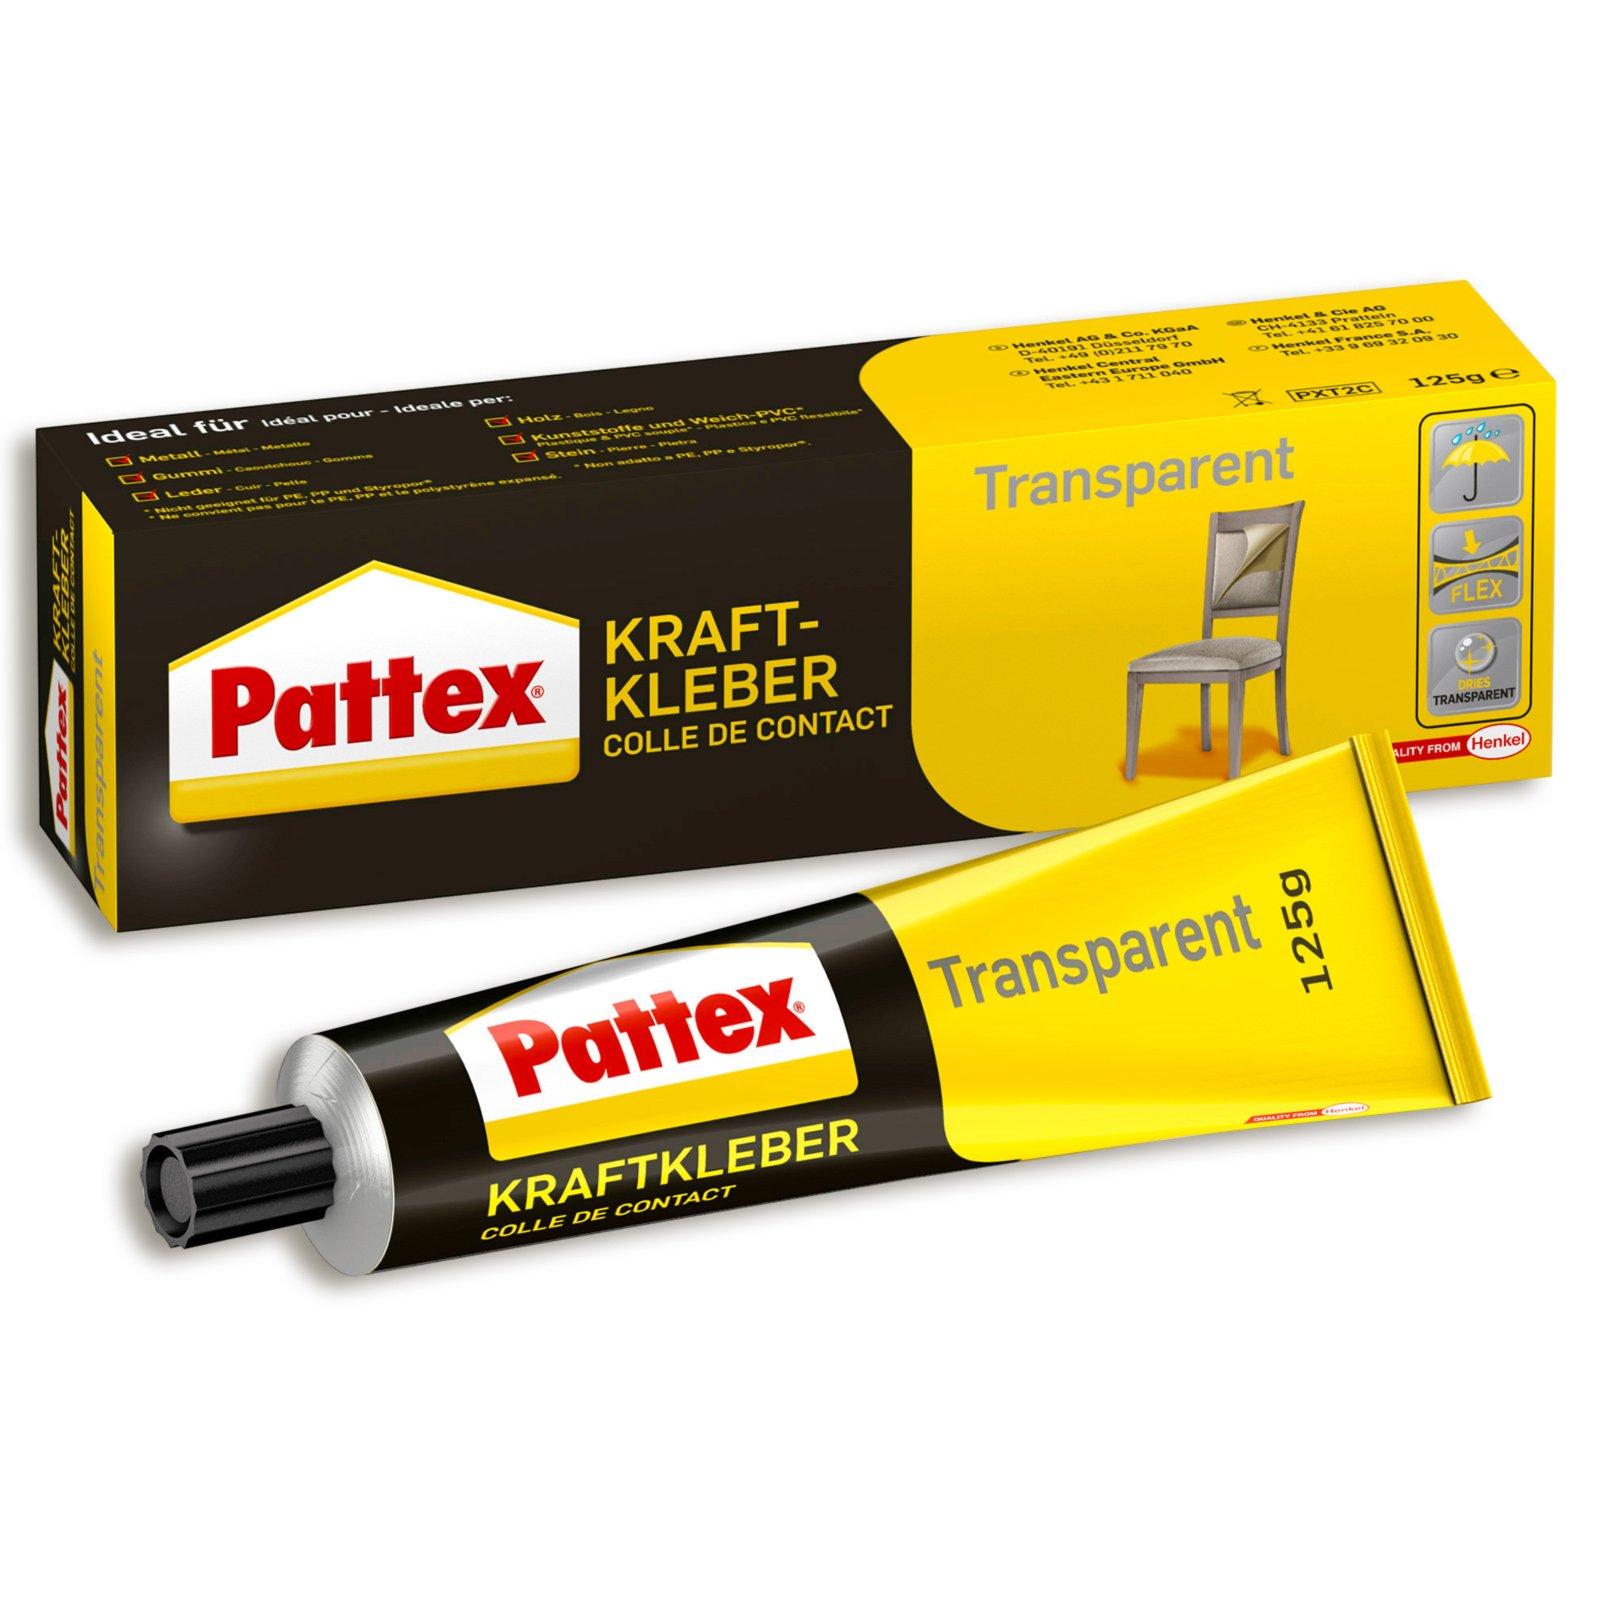 Pattex Kraftkleber - transparent - 125 g